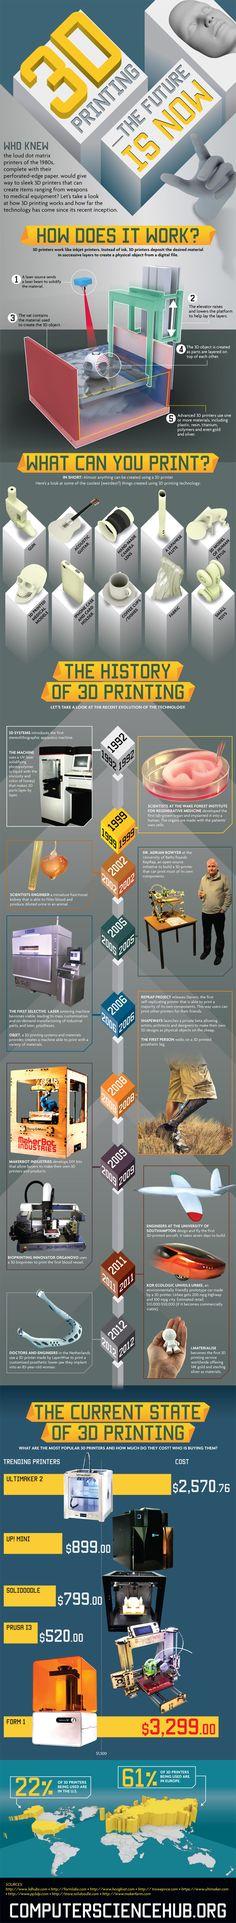 Historia de las impresoras 3D